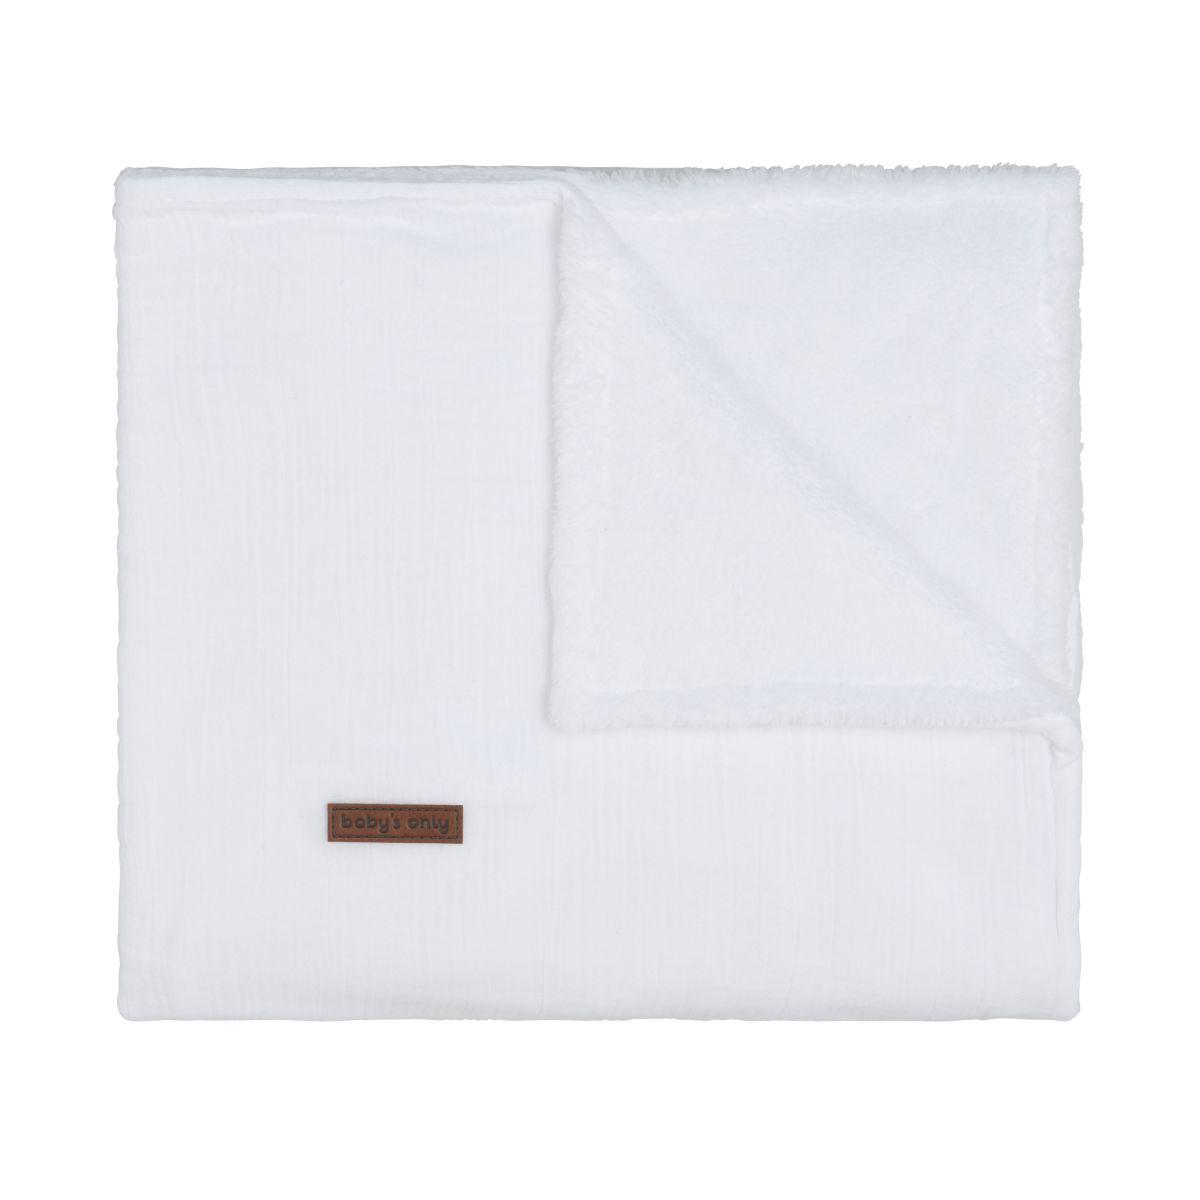 cot blanket teddy breeze white